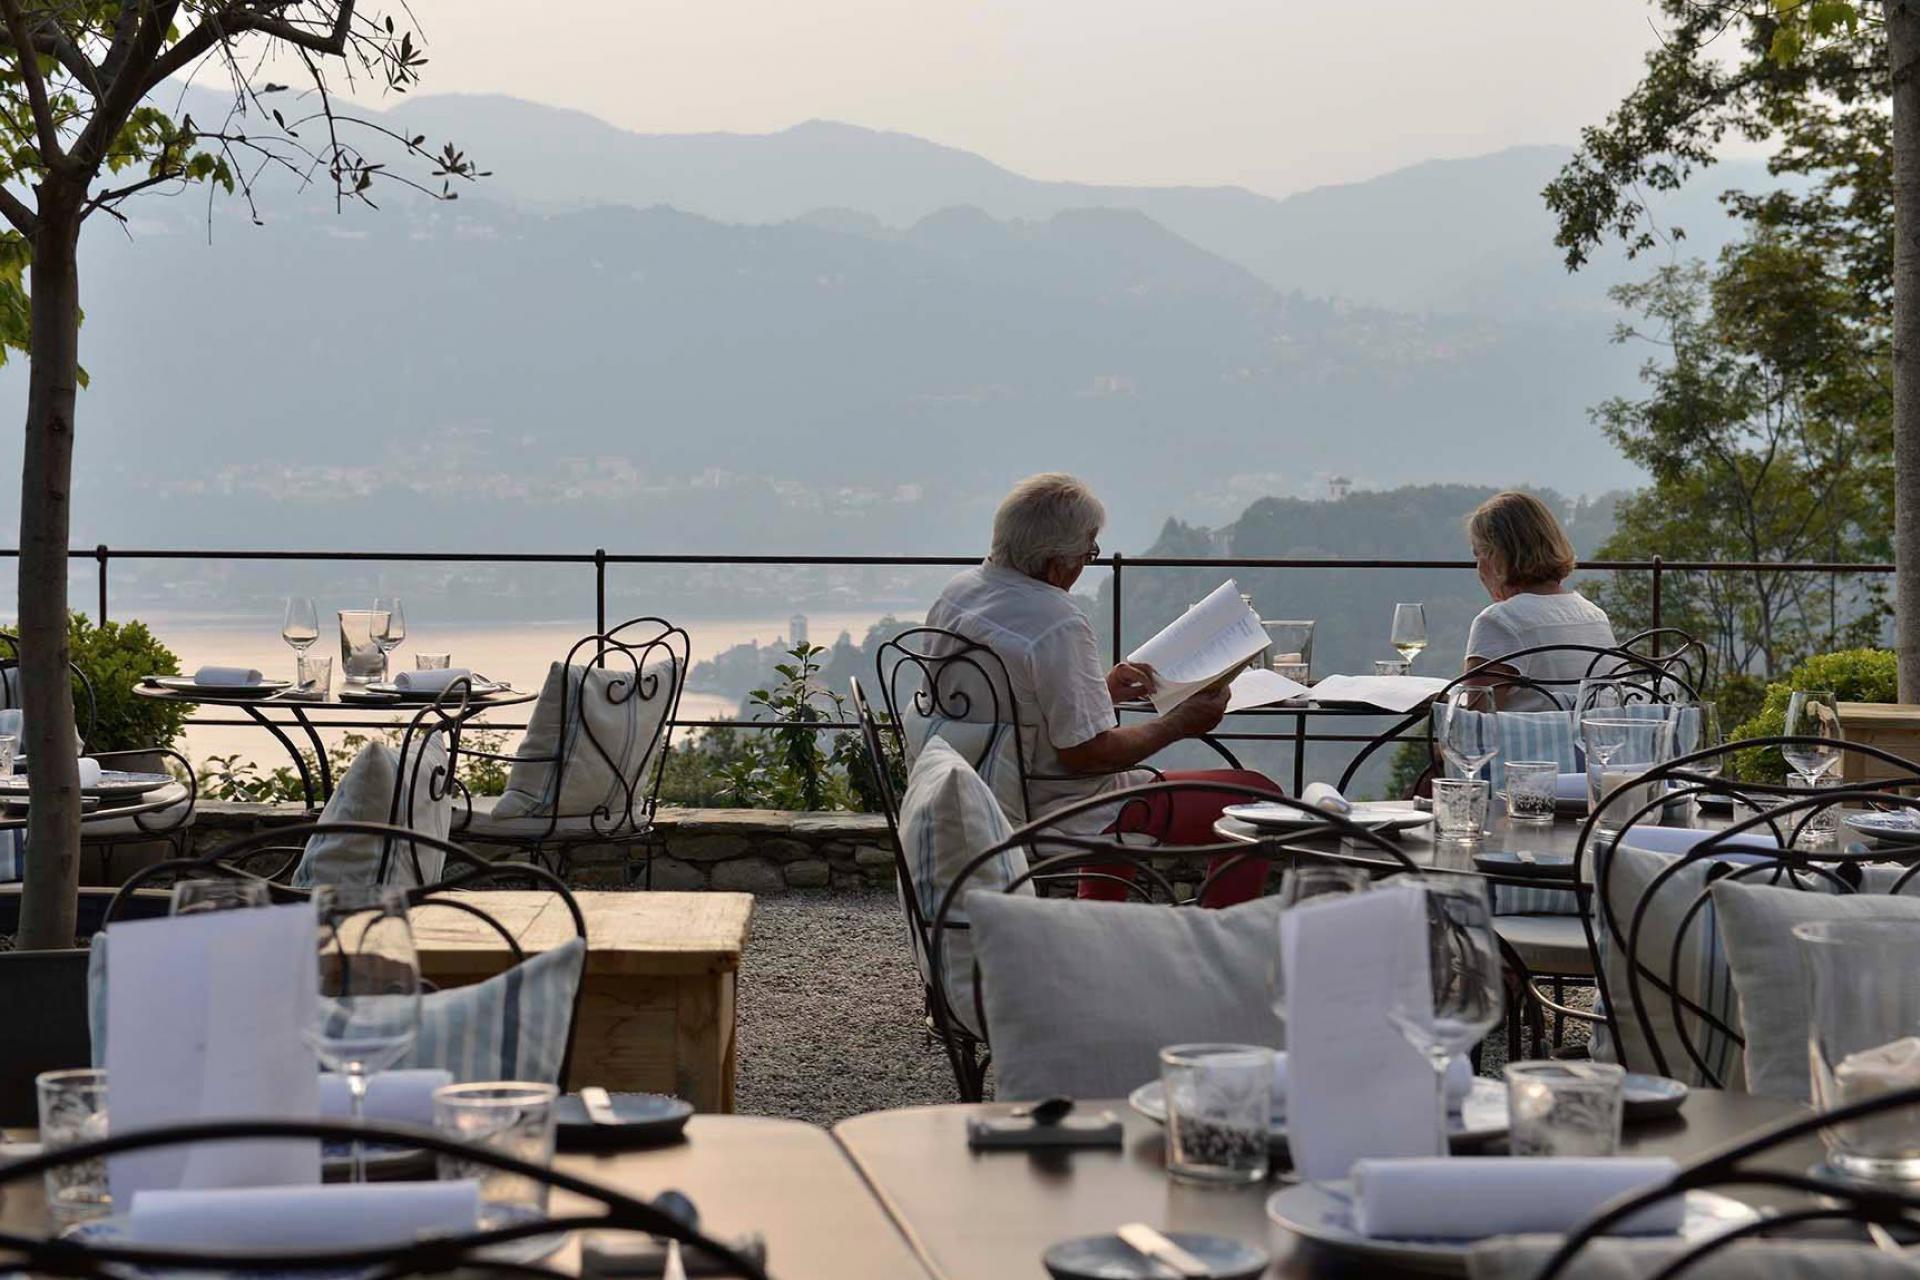 Agriturismo Lake Como and Lake Garda Agriturismo Lake Maggiore with outstanding views